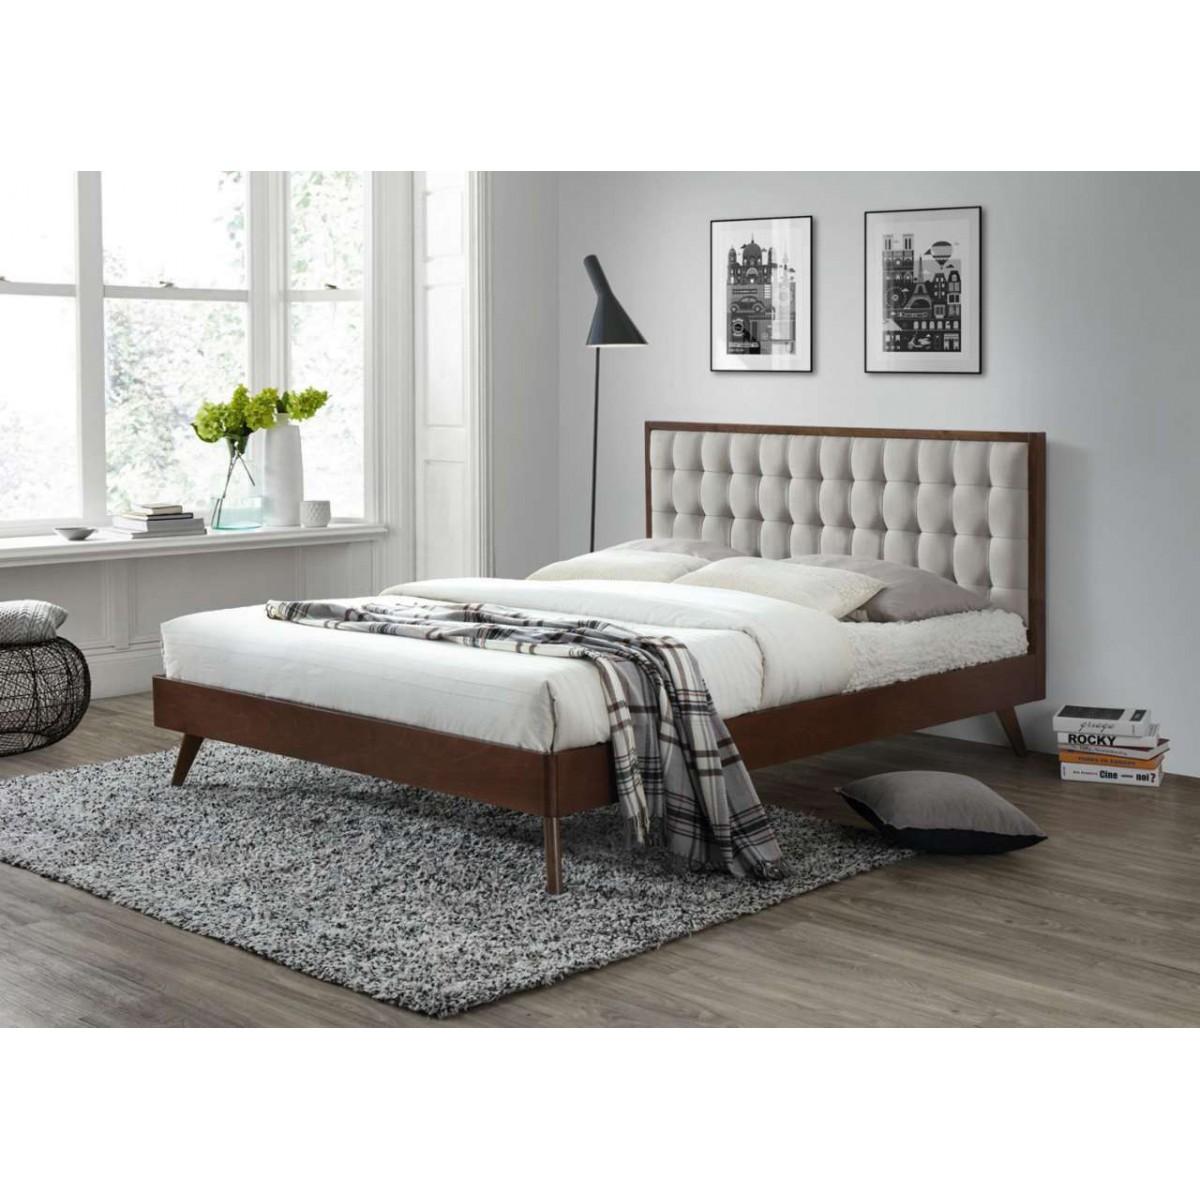 Solomo łóżko 160